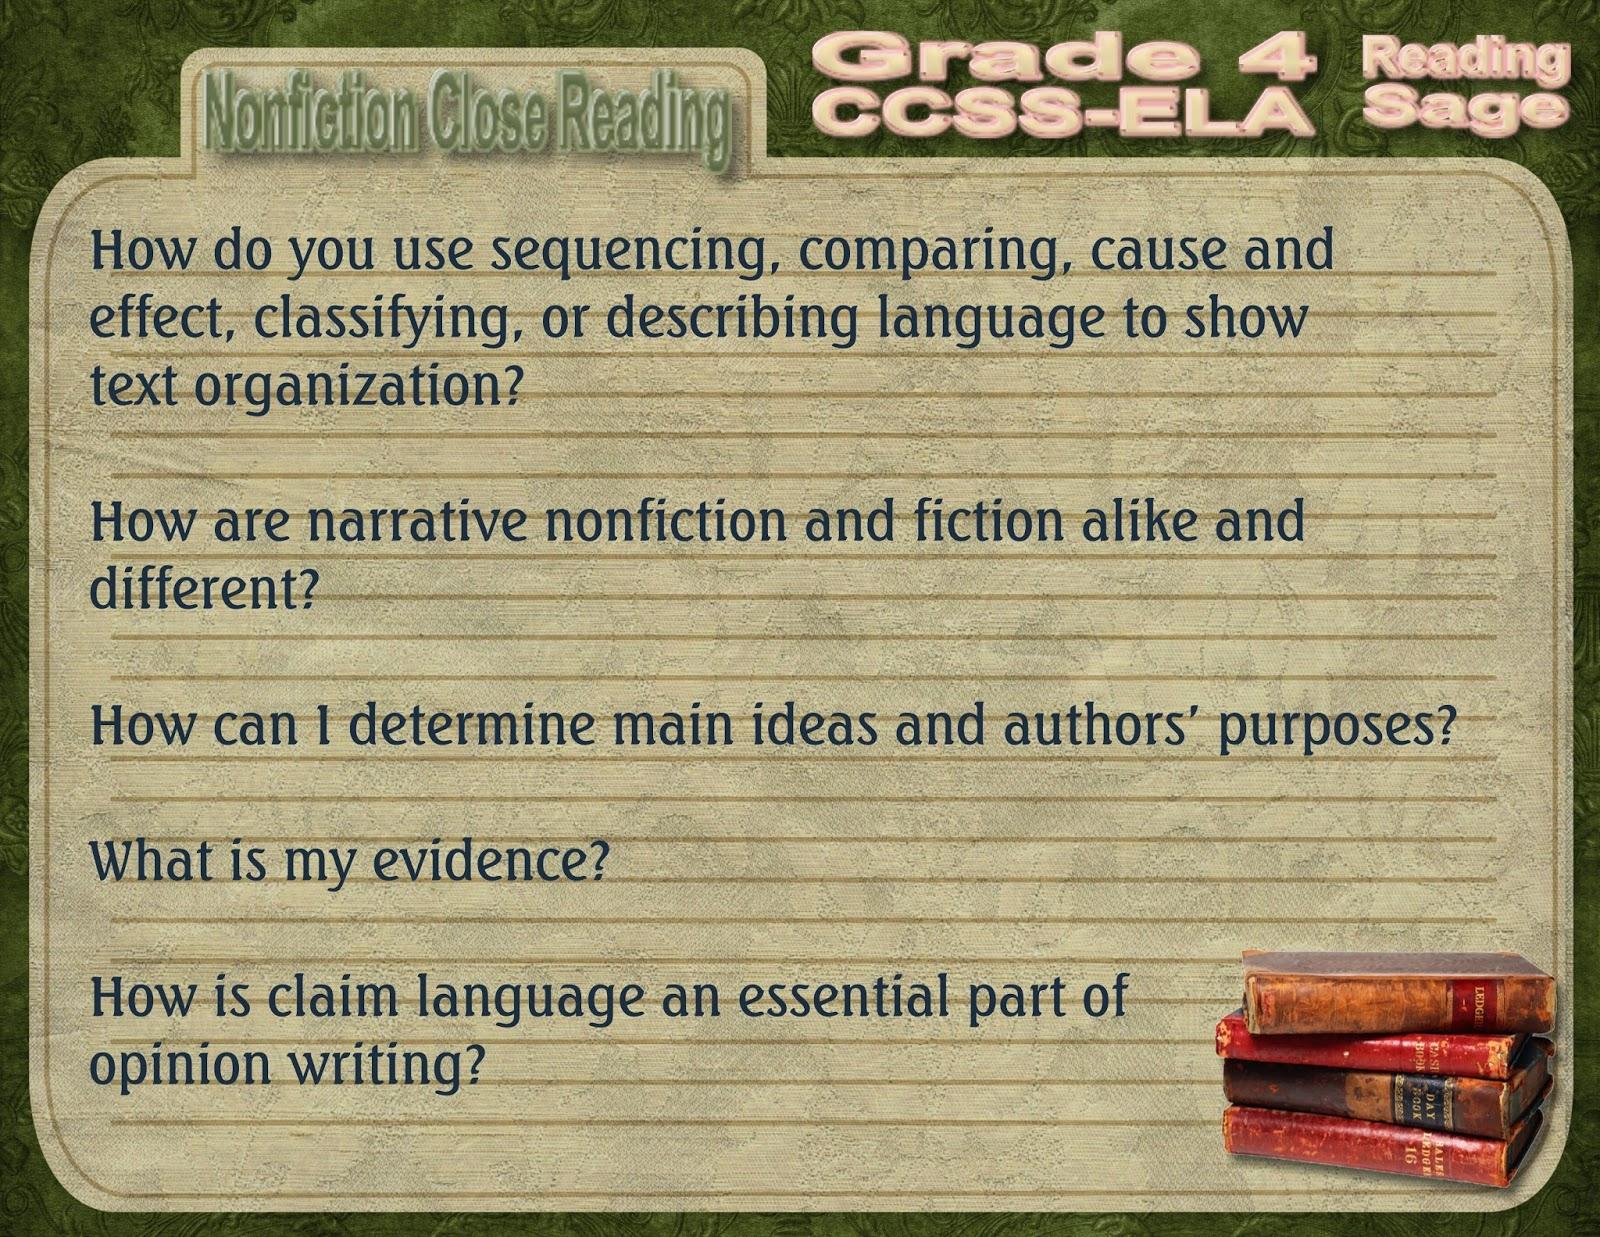 Reading Sage Grade 4 Nonfiction Close Reading Question Stems